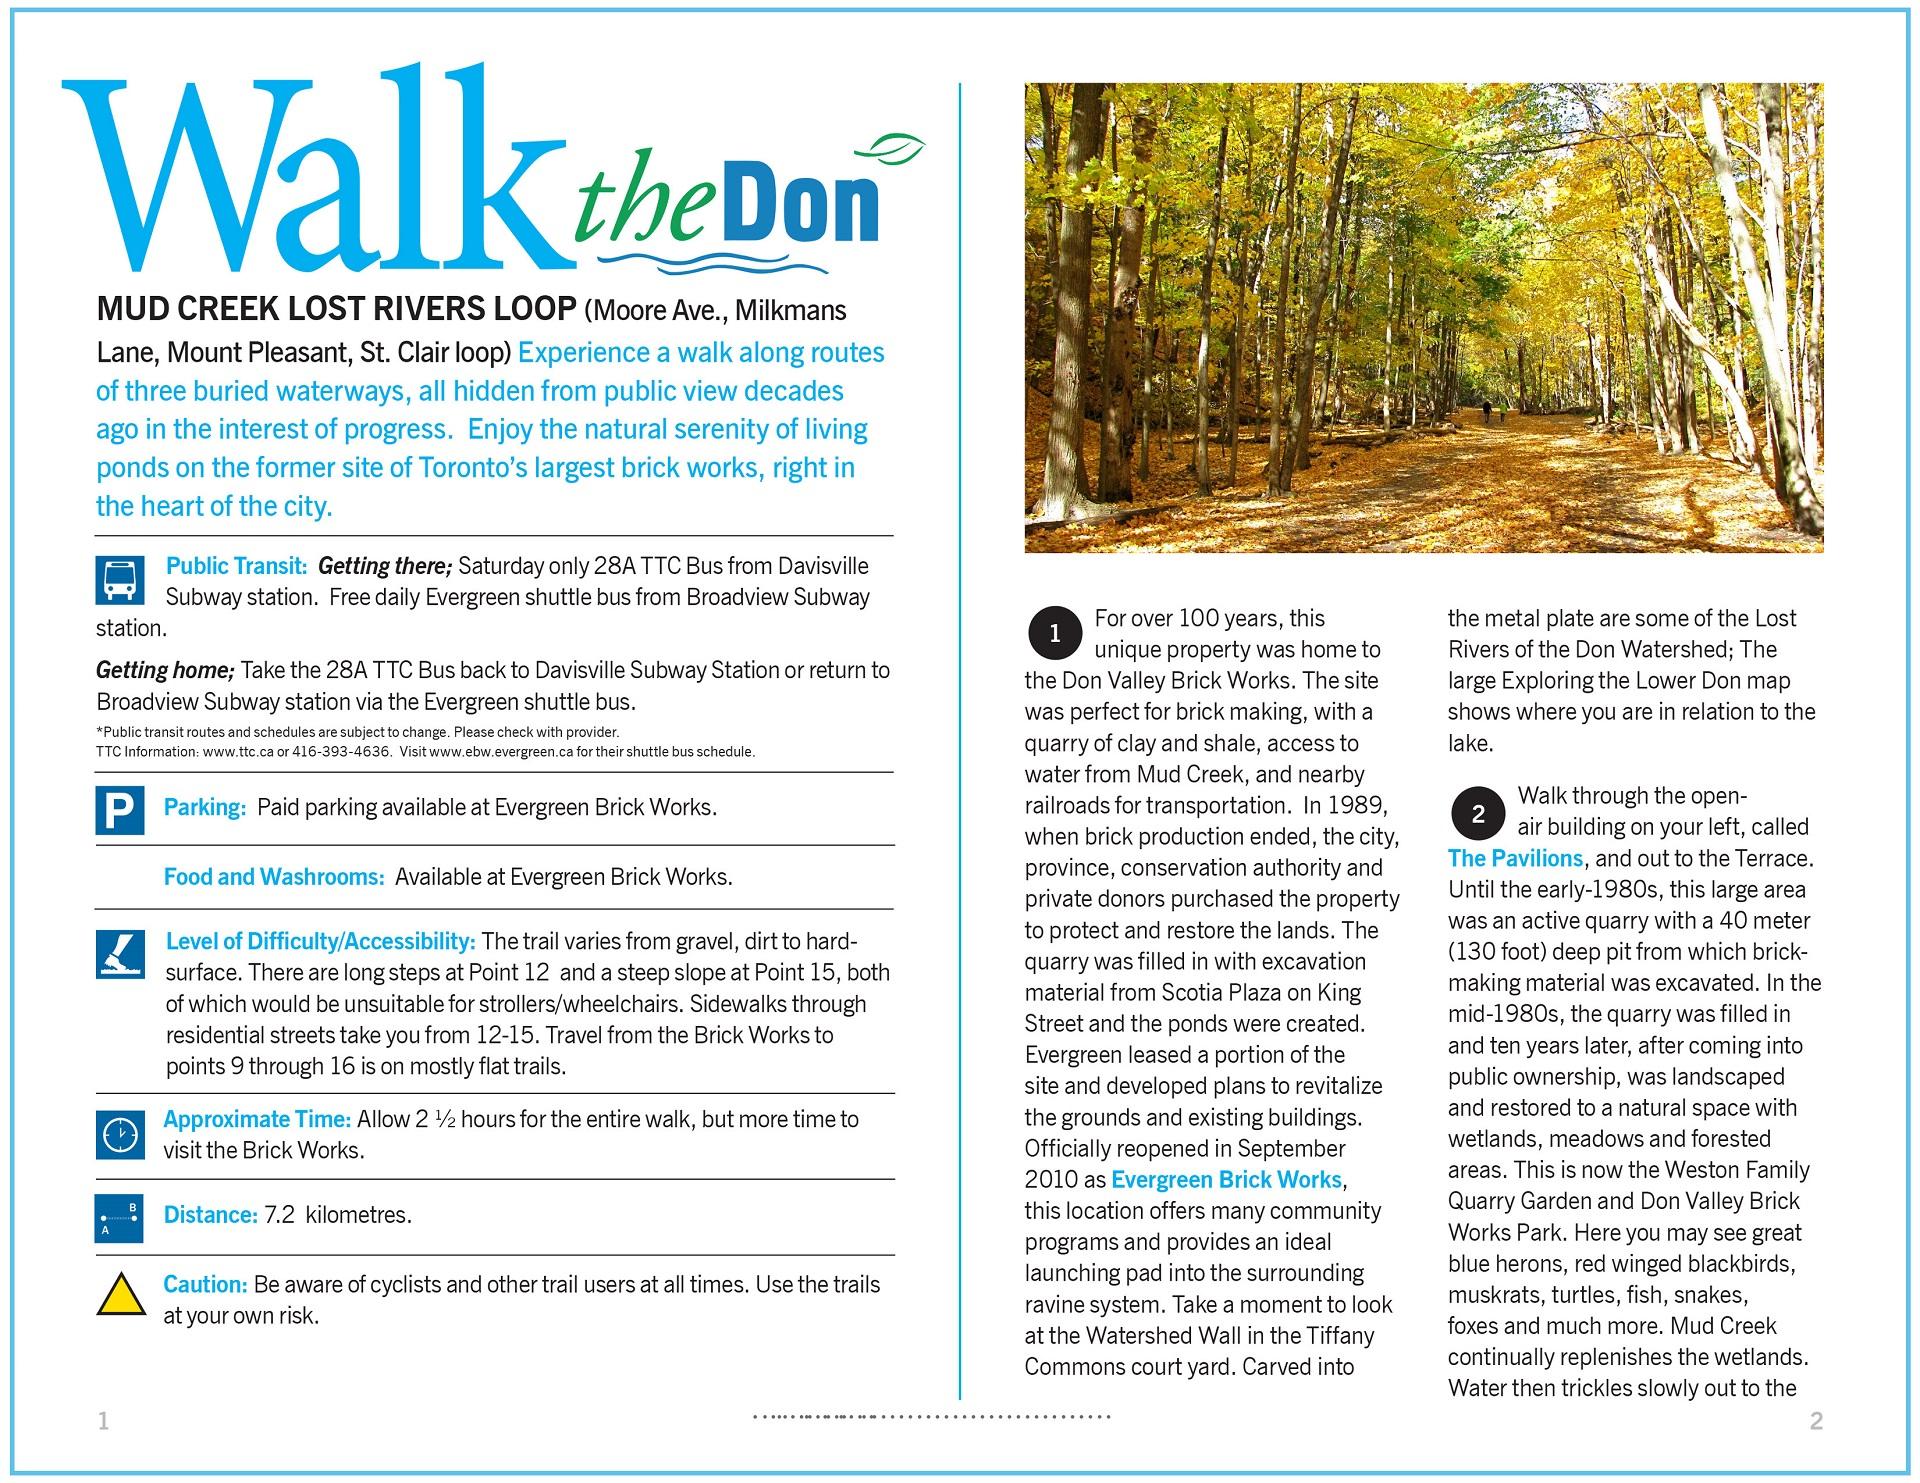 Walk the Don - Mud Creek Lost Rivers Loop Trail Guide